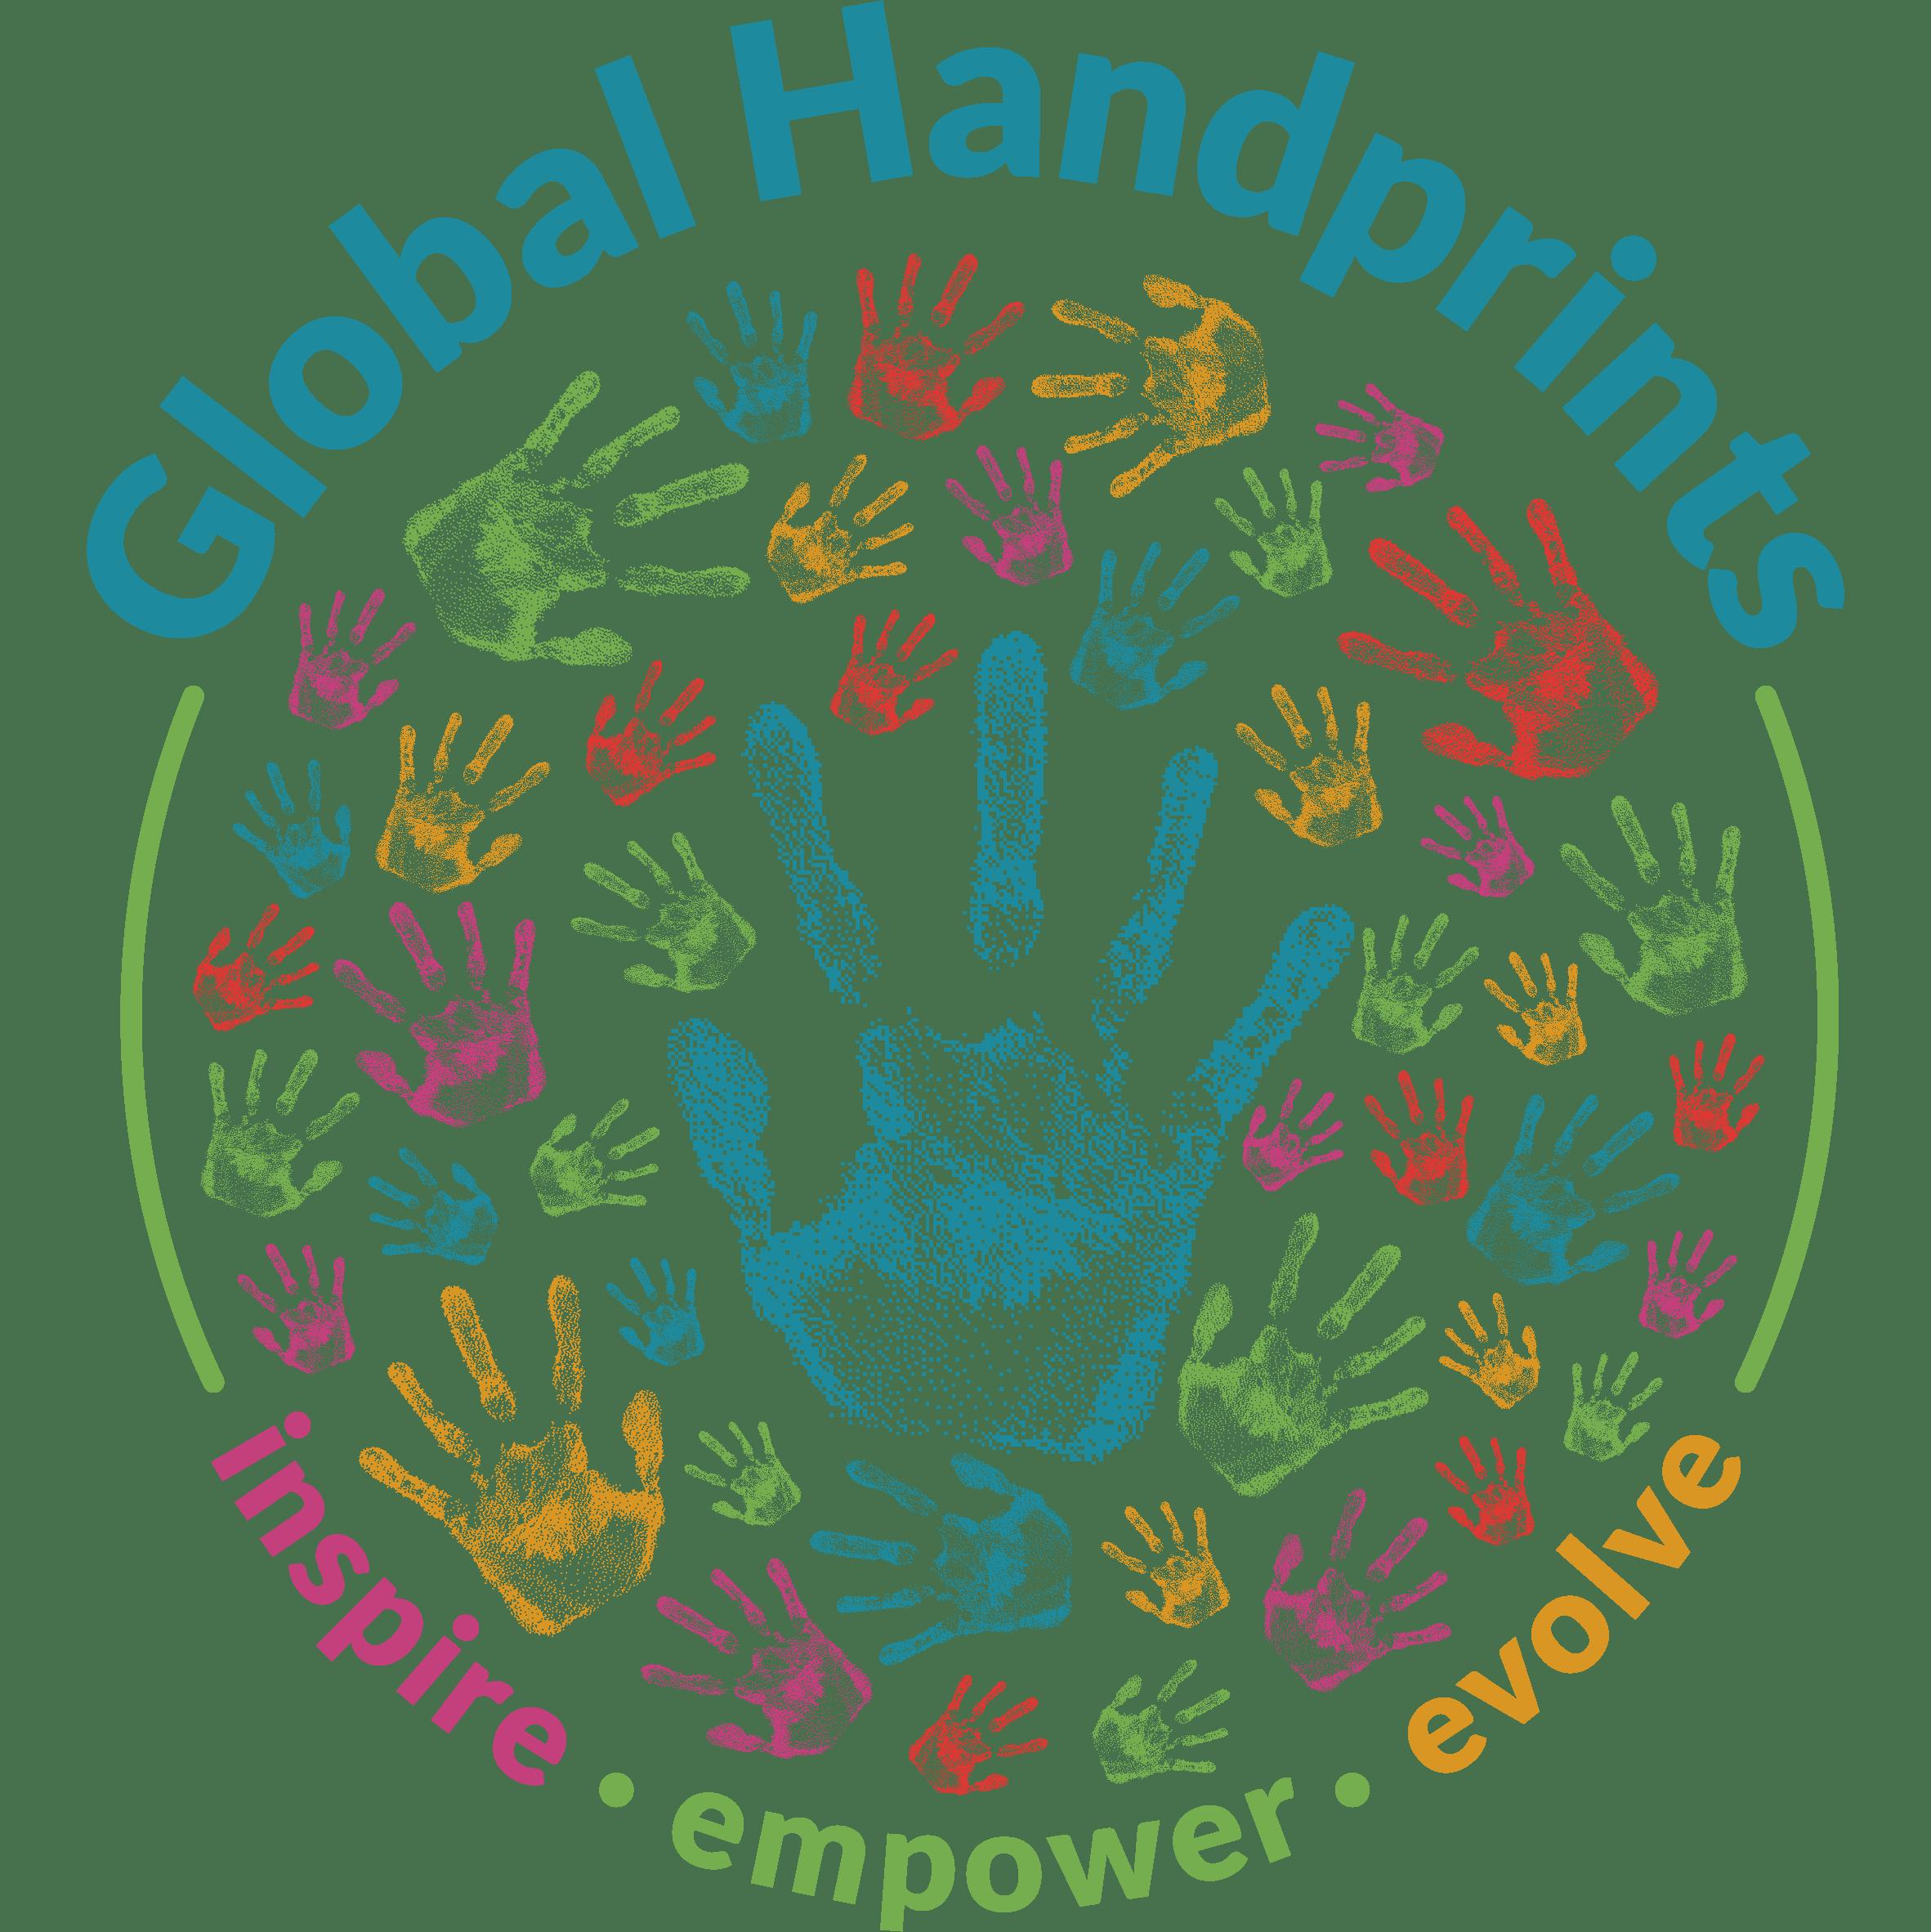 Global Handprints